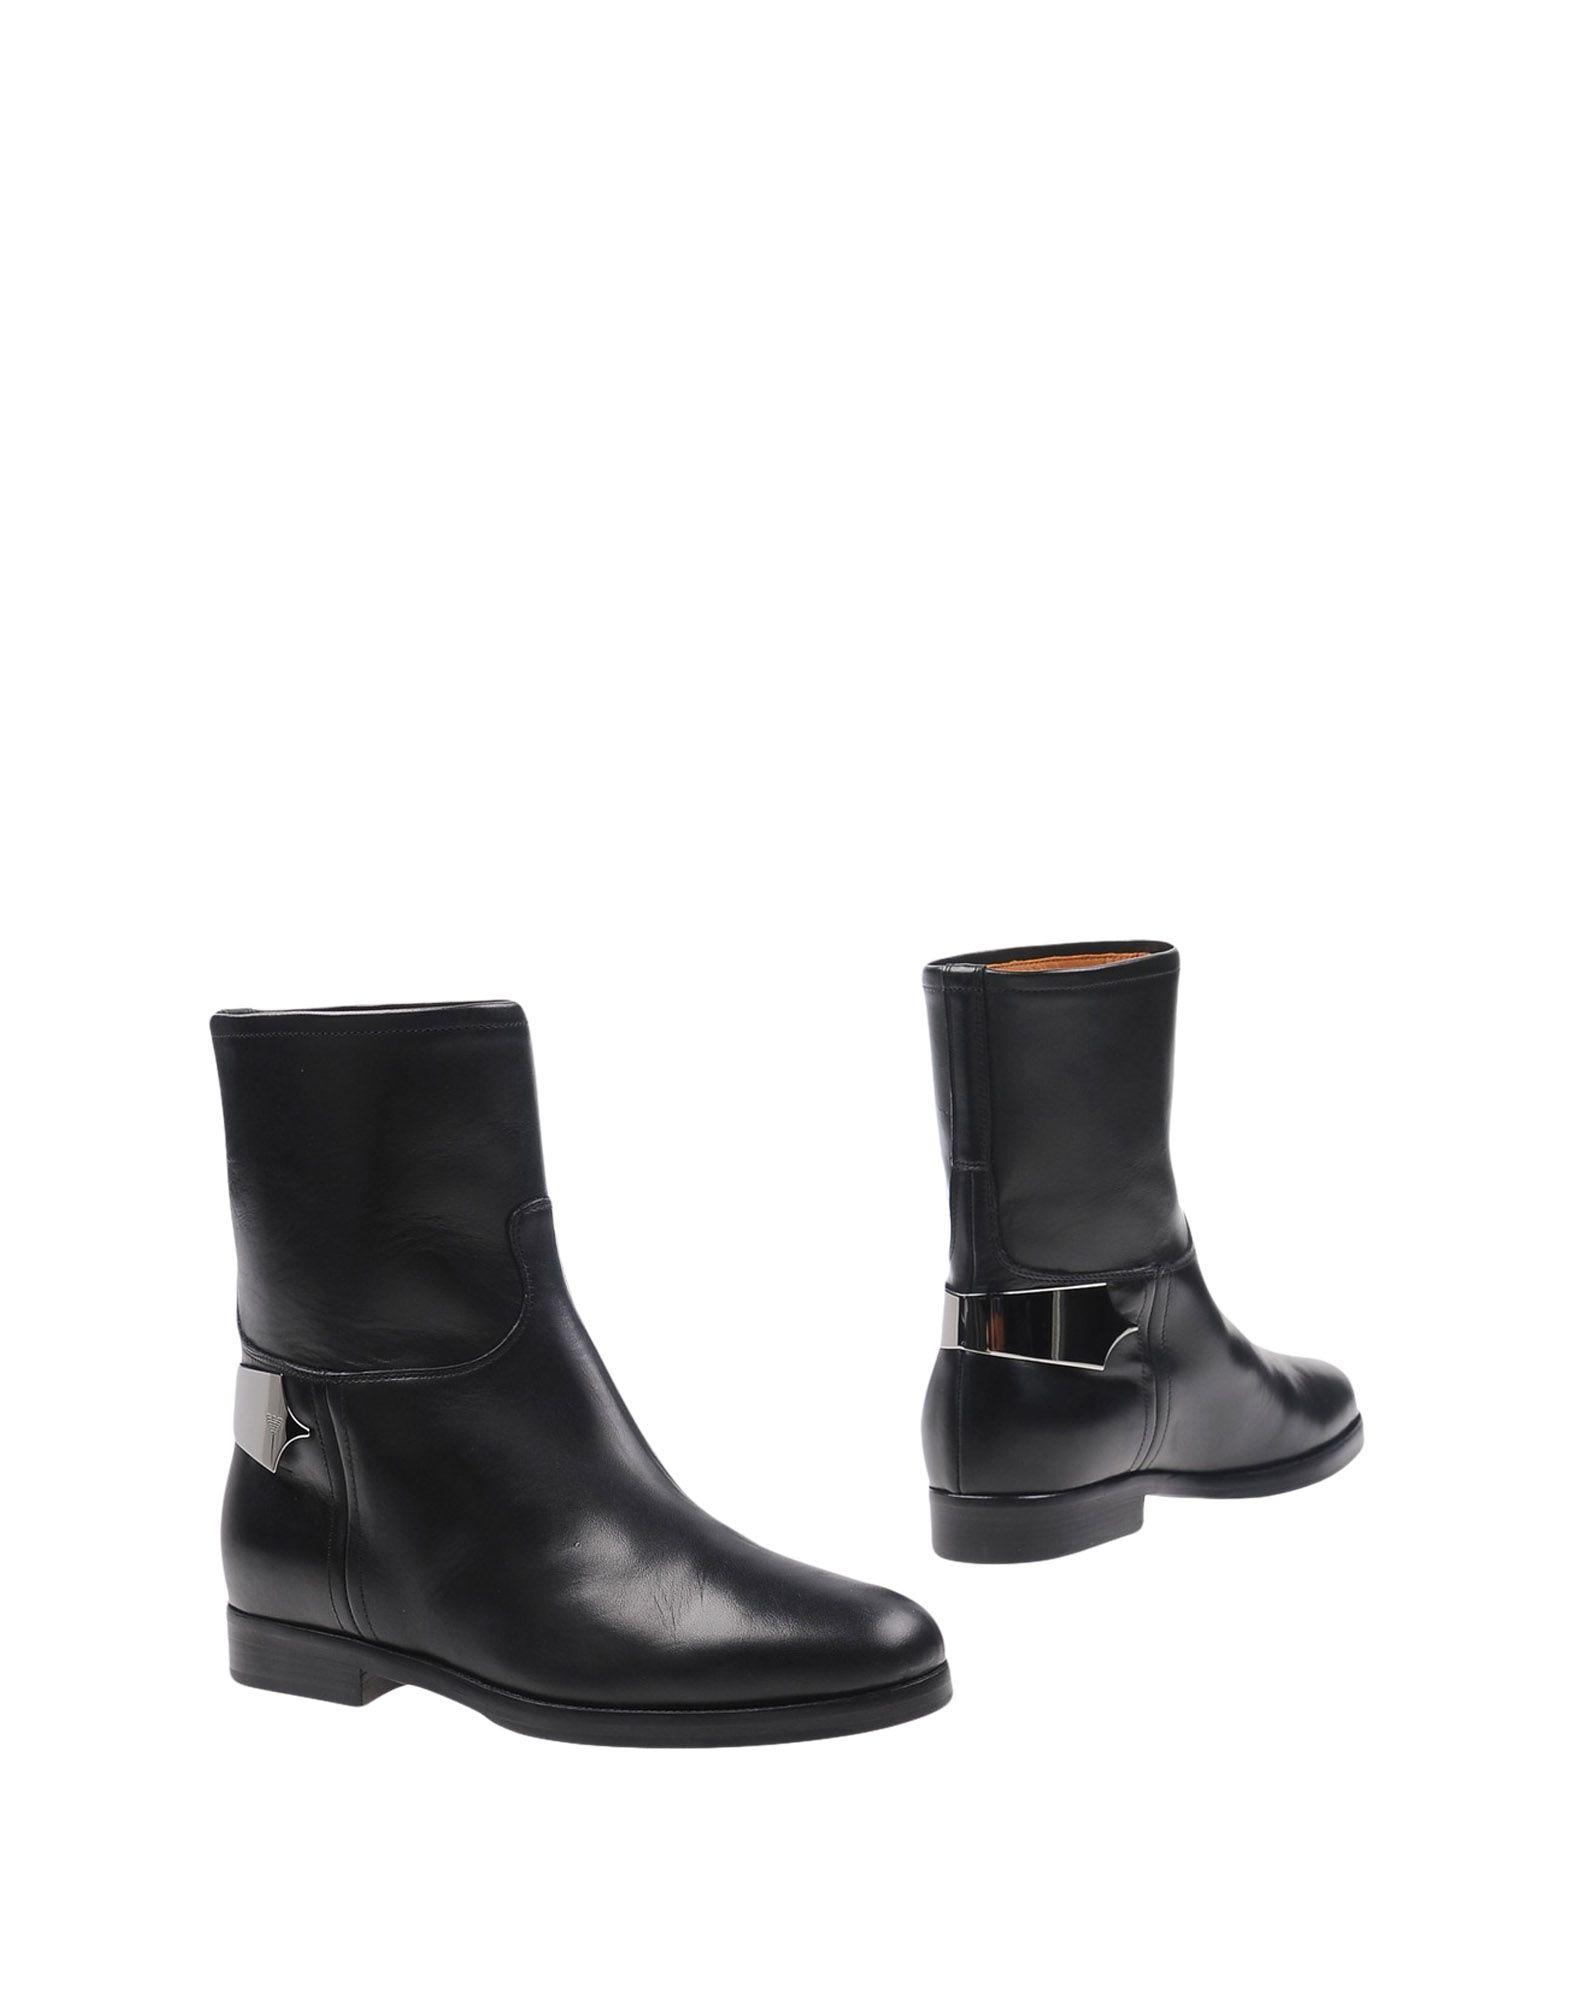 EMPORIO ARMANI Полусапоги и высокие ботинки armani junior полусапоги и высокие ботинки